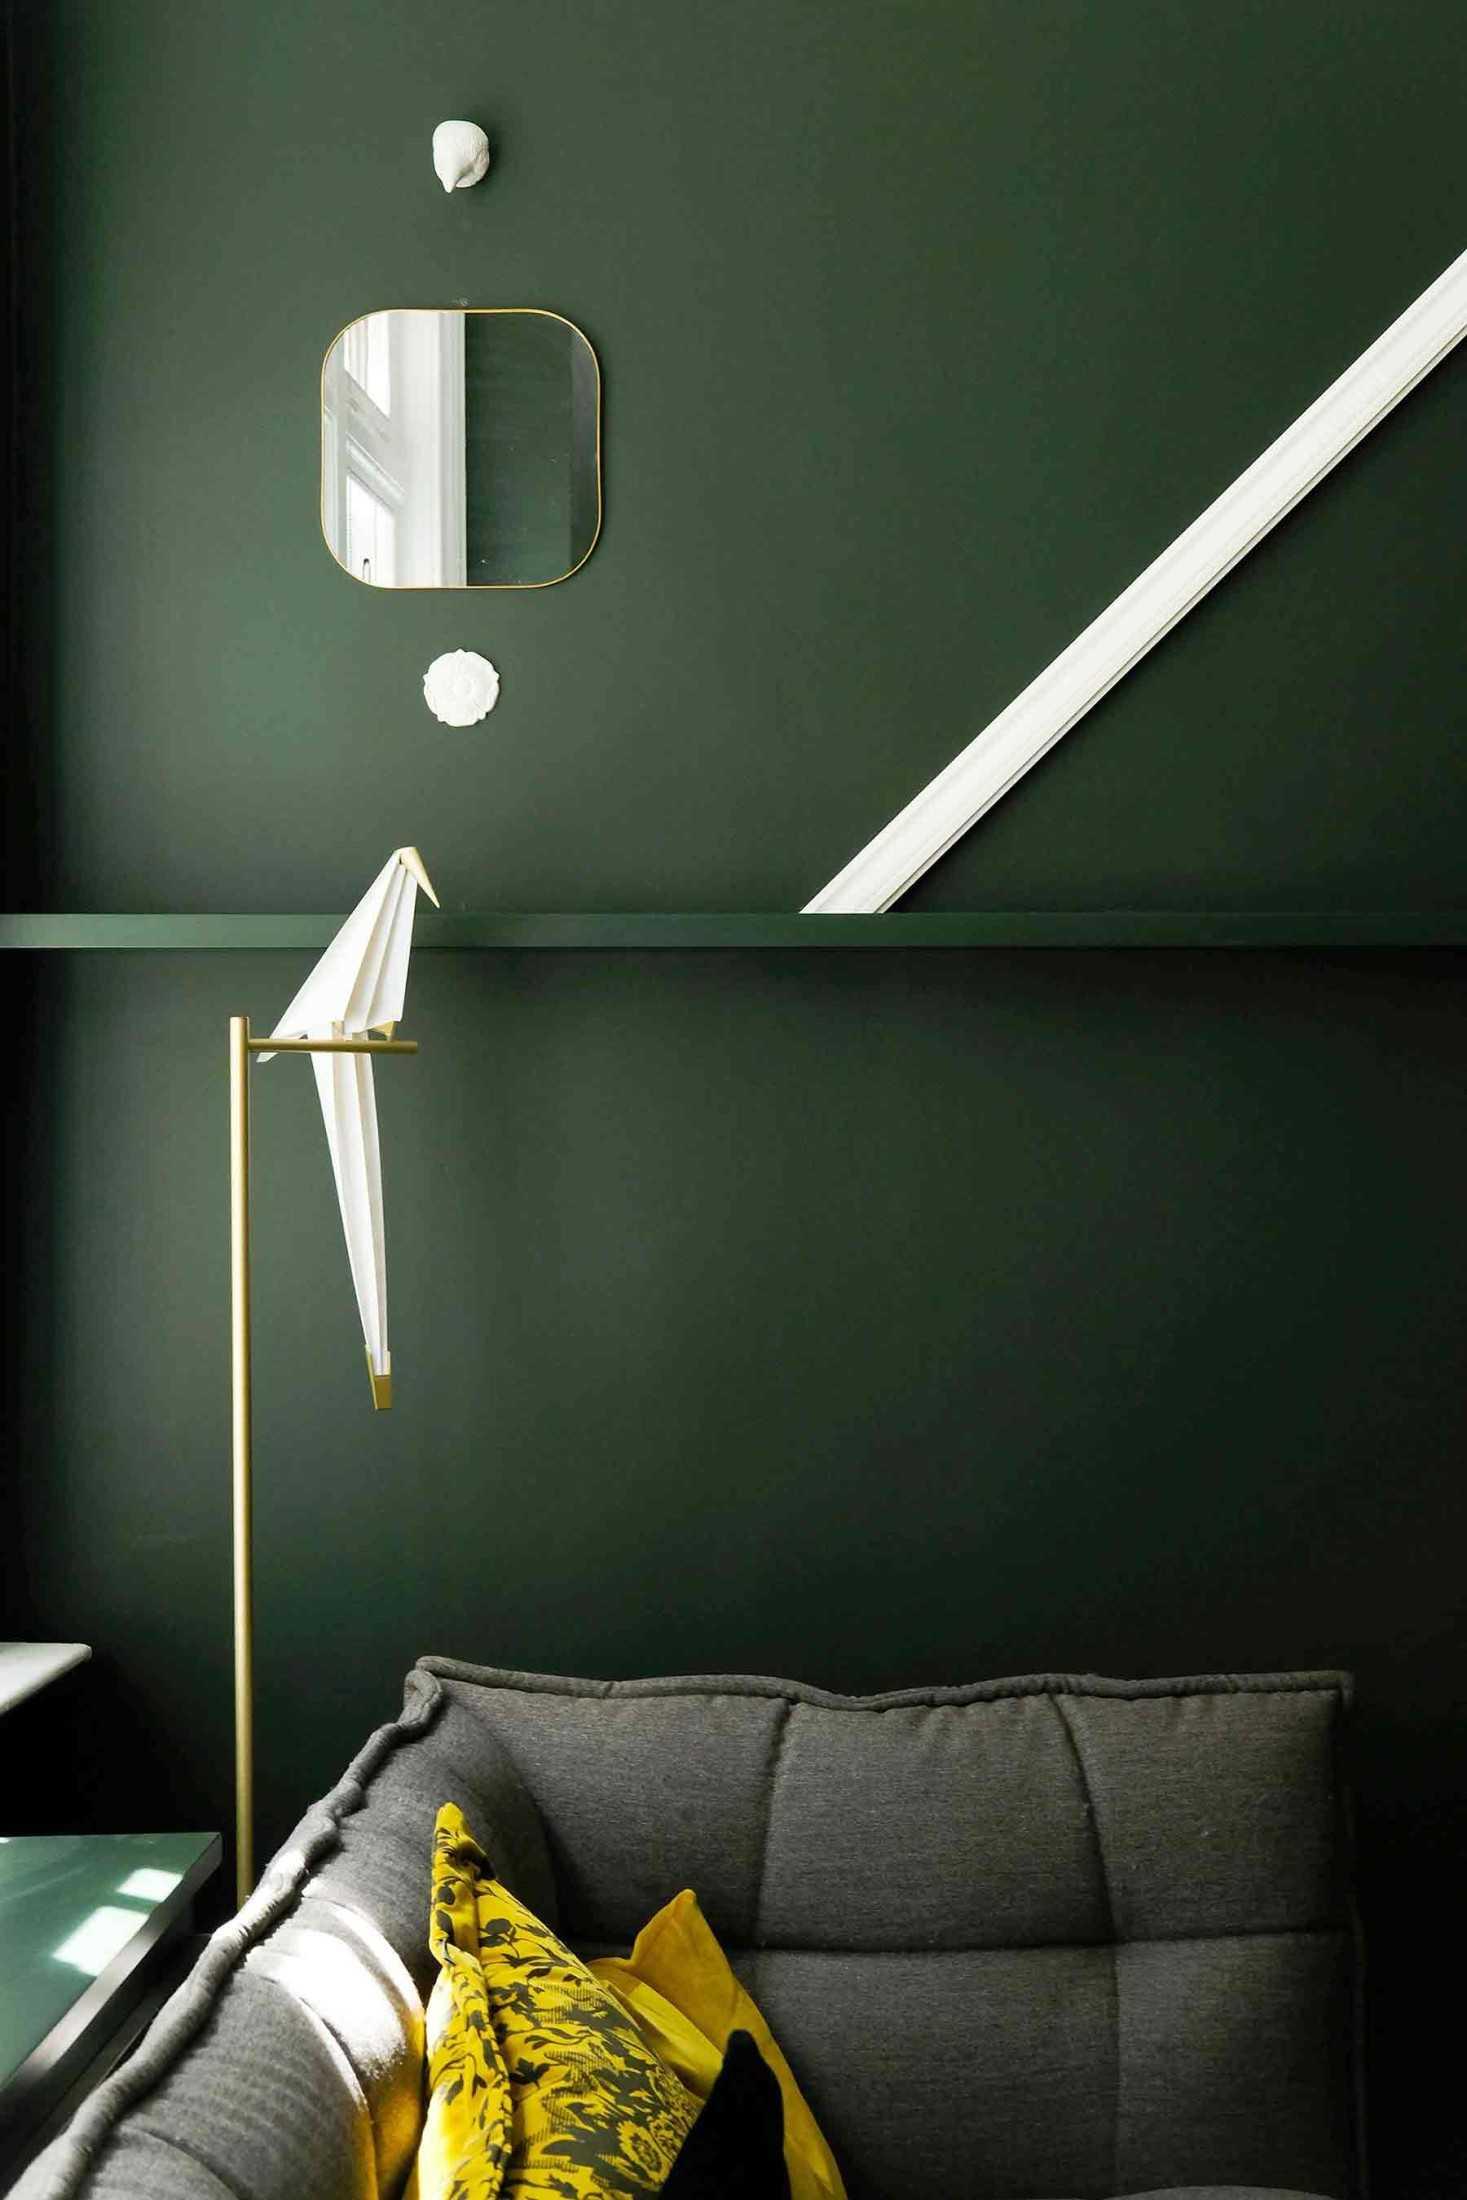 Cermin pada dinding hijau gelap, foto oleh Aaina Sharma, via unsplash.com